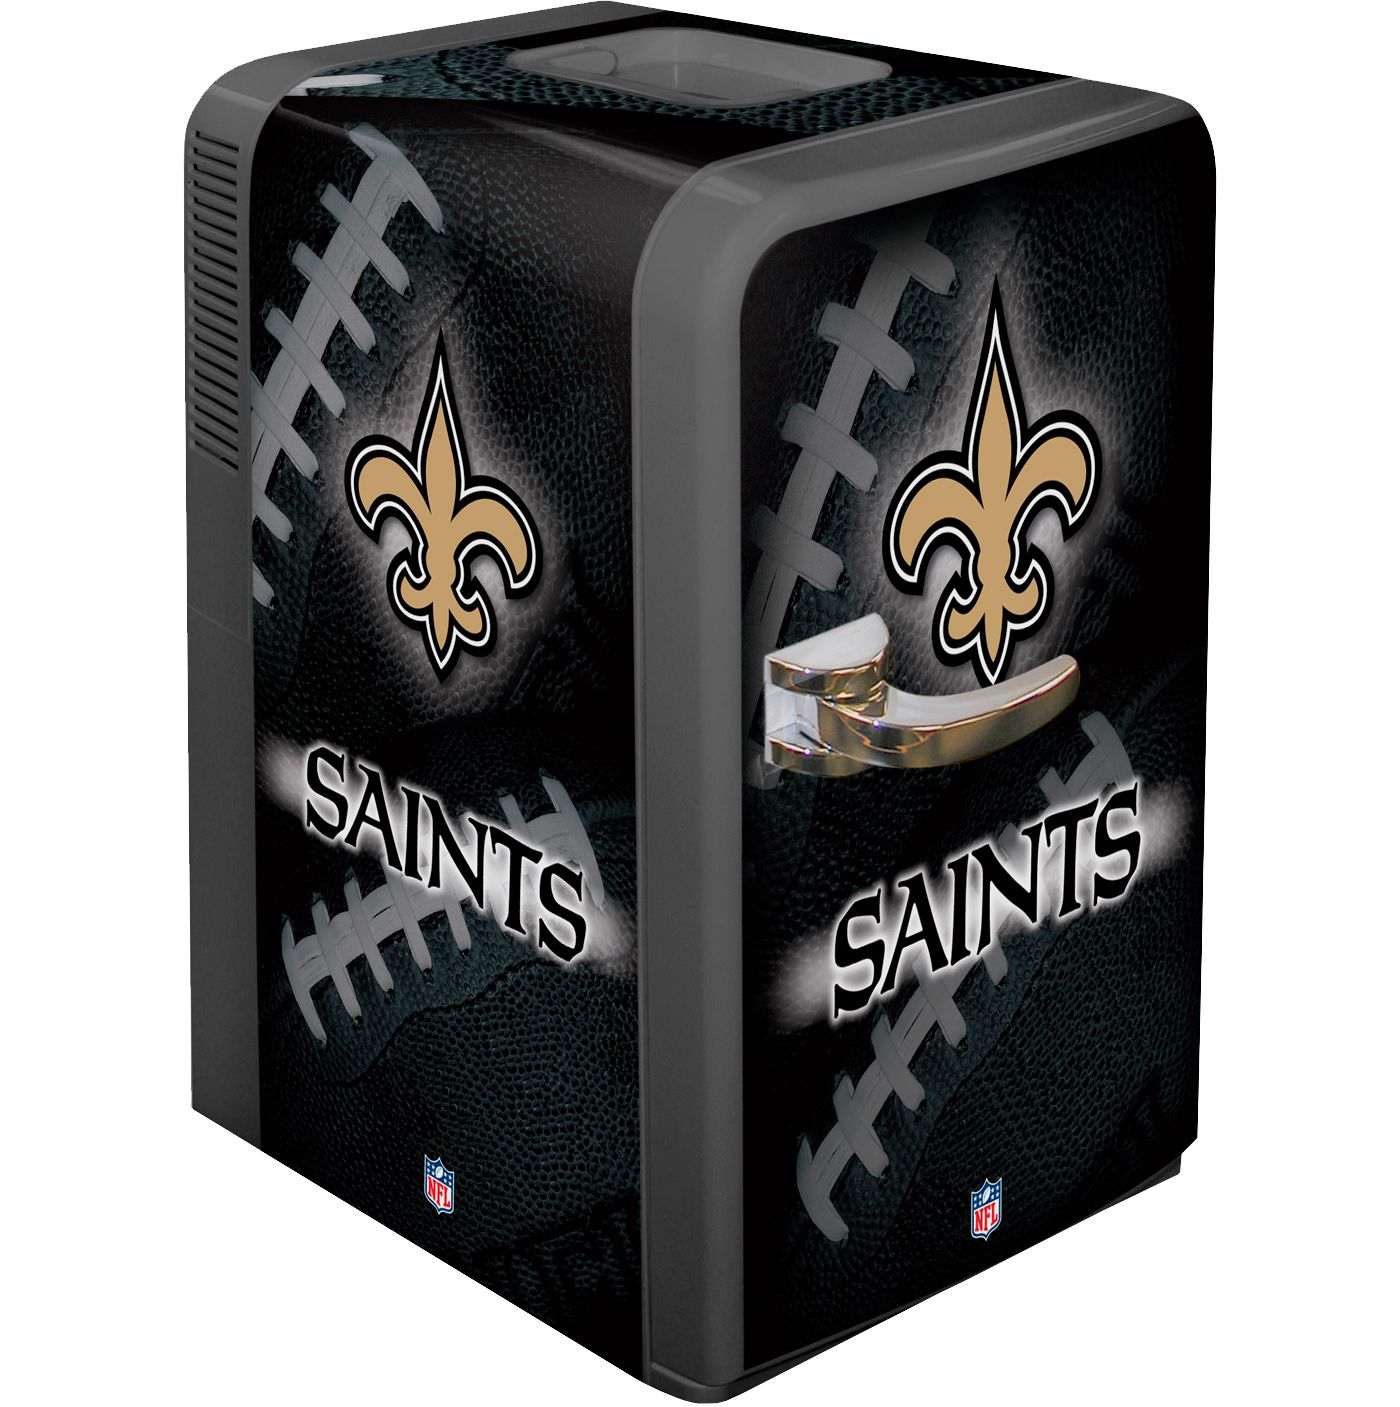 Boelter New Orleans Saints 15q Portable Party Refrigerator